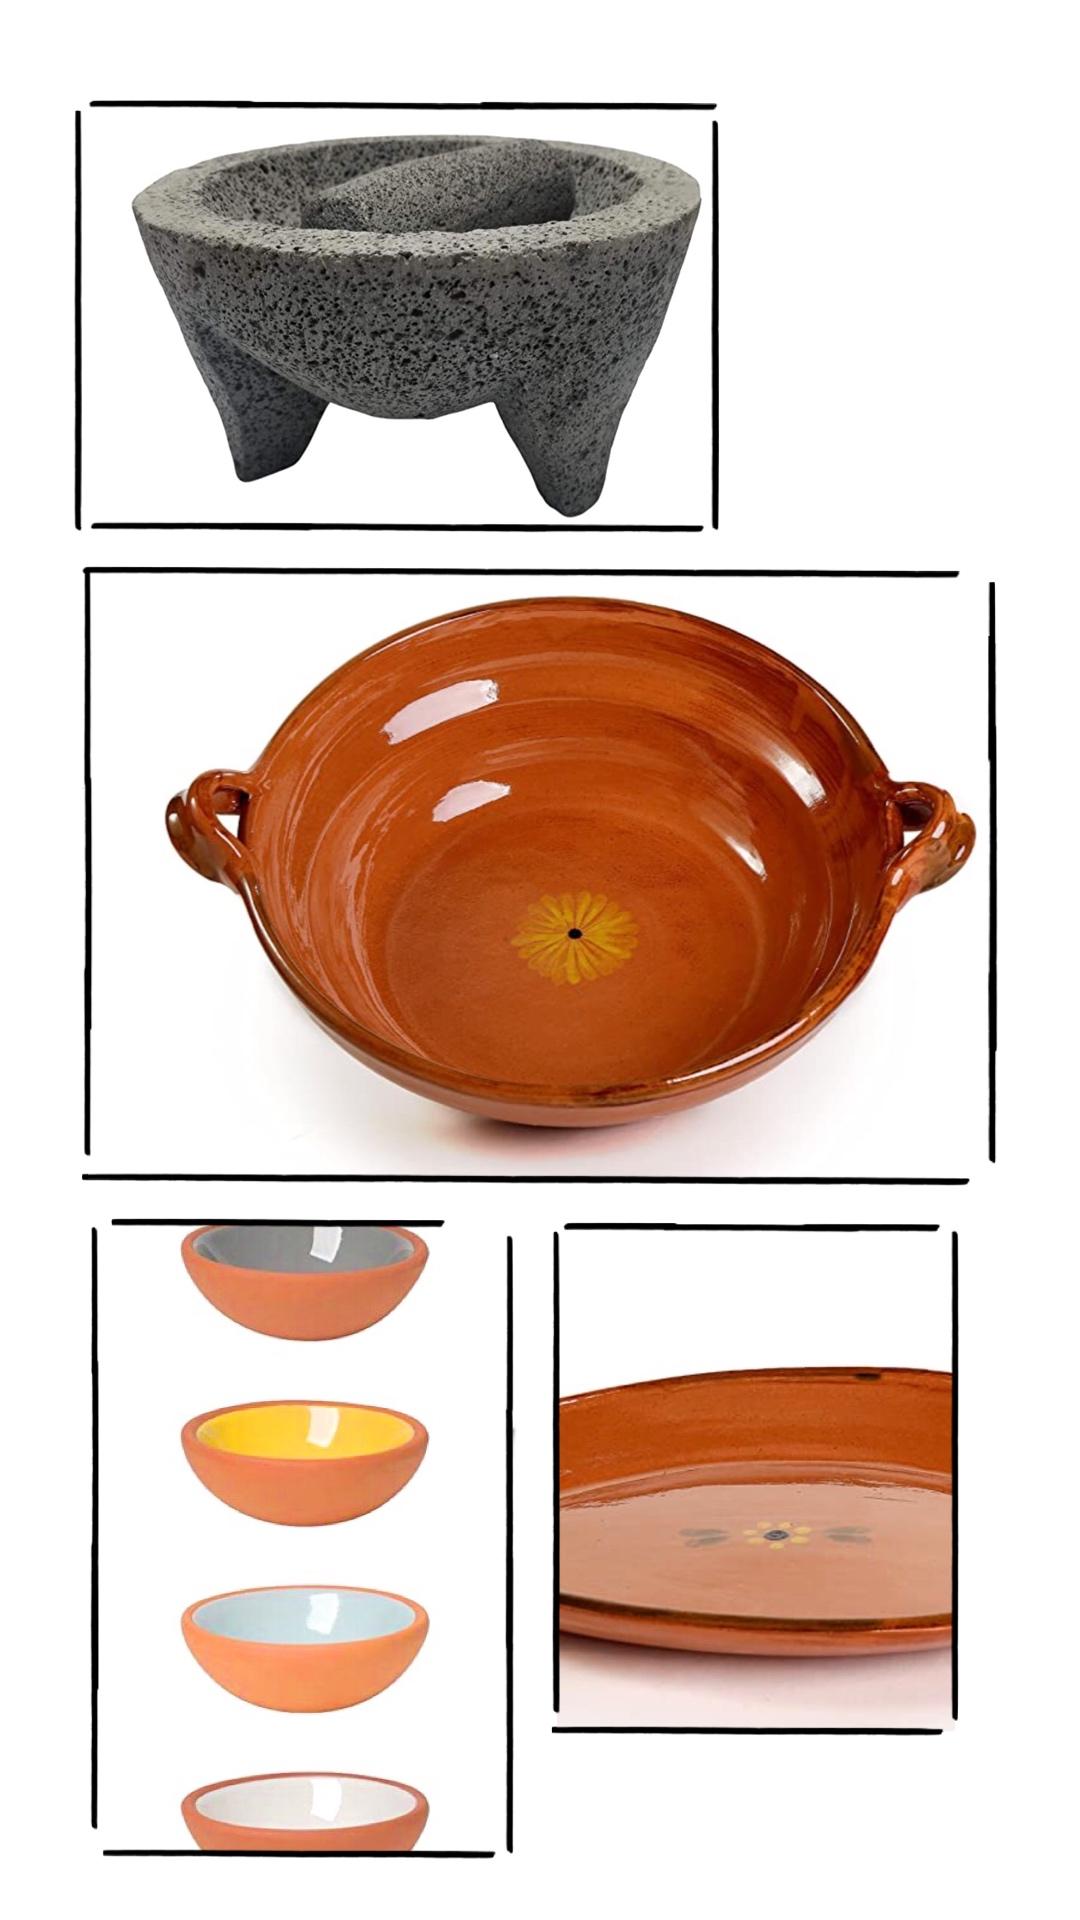 Molcajete, cazuela, clay platter, small clay bowls